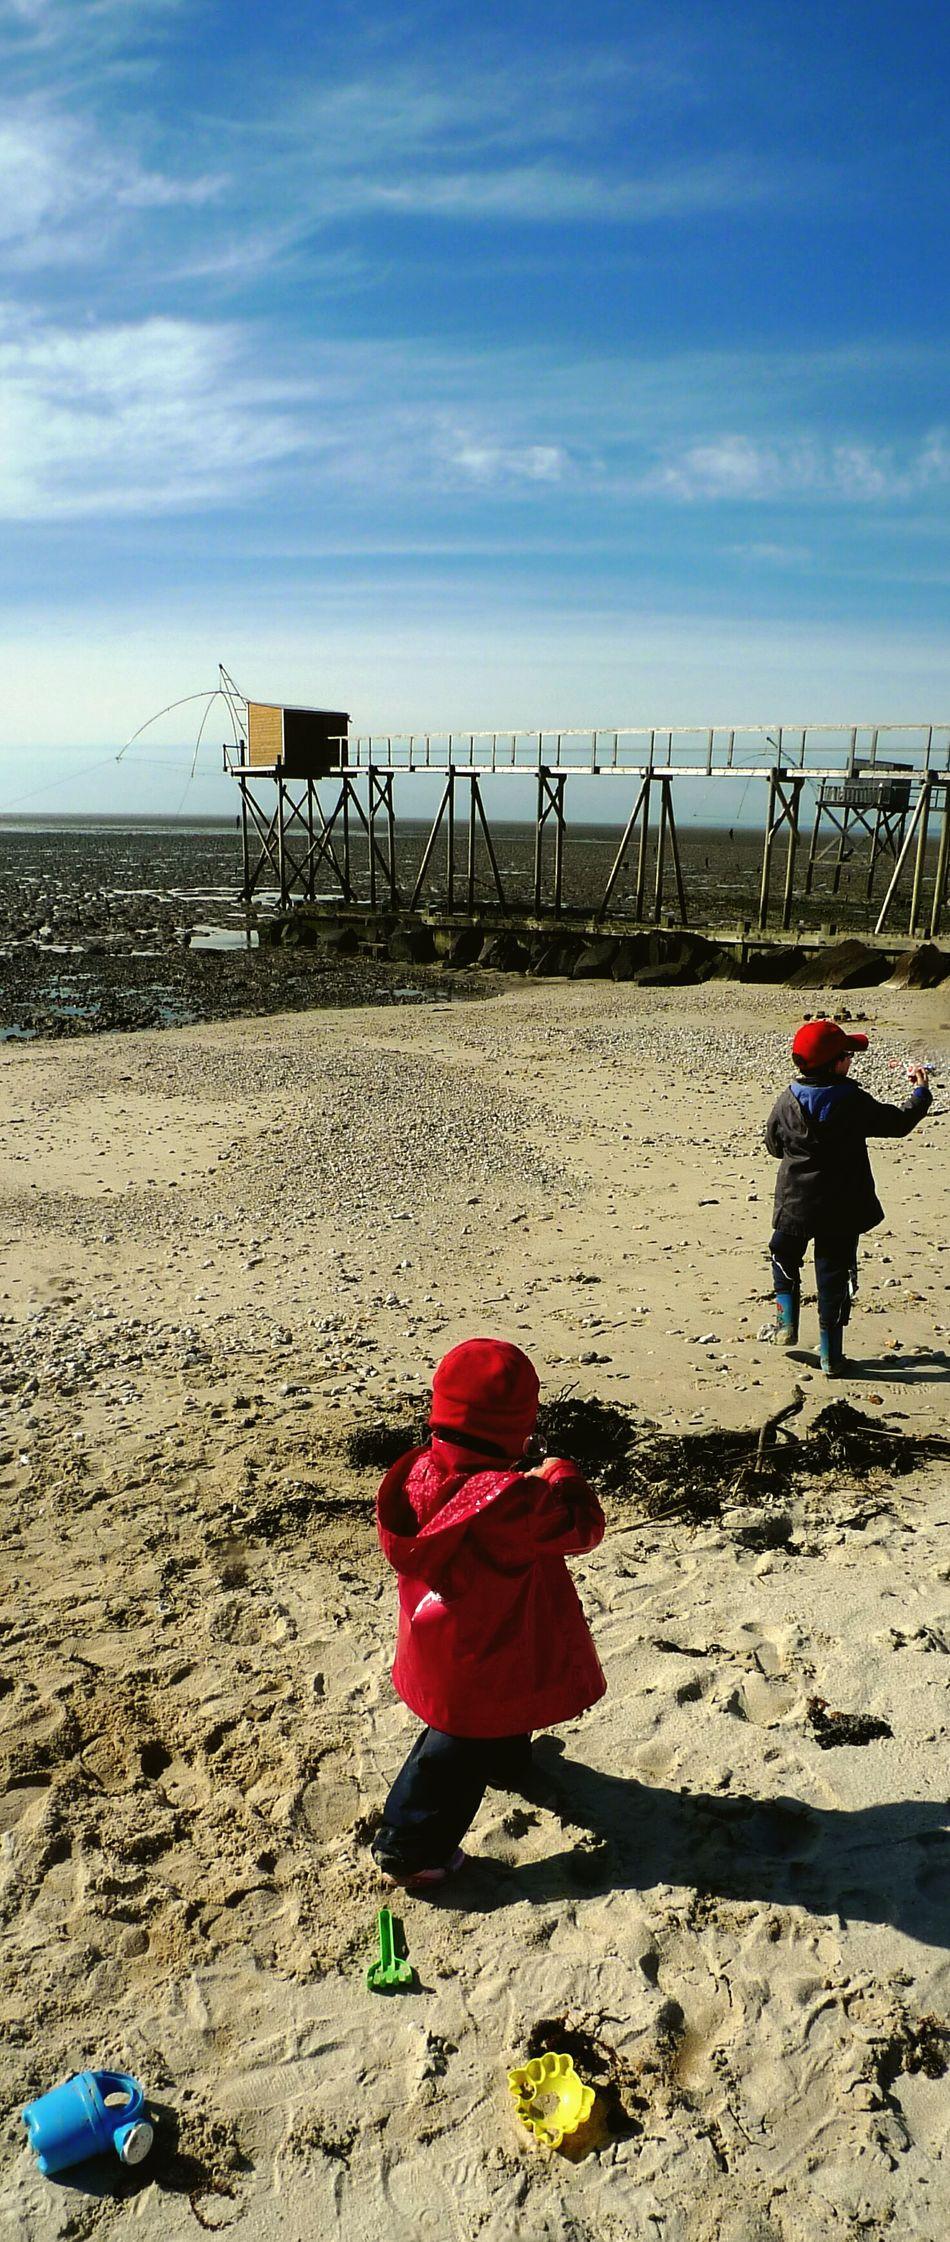 Beach Enjoying Life Brother & Sister Sea Fishermens Hut Carrelets